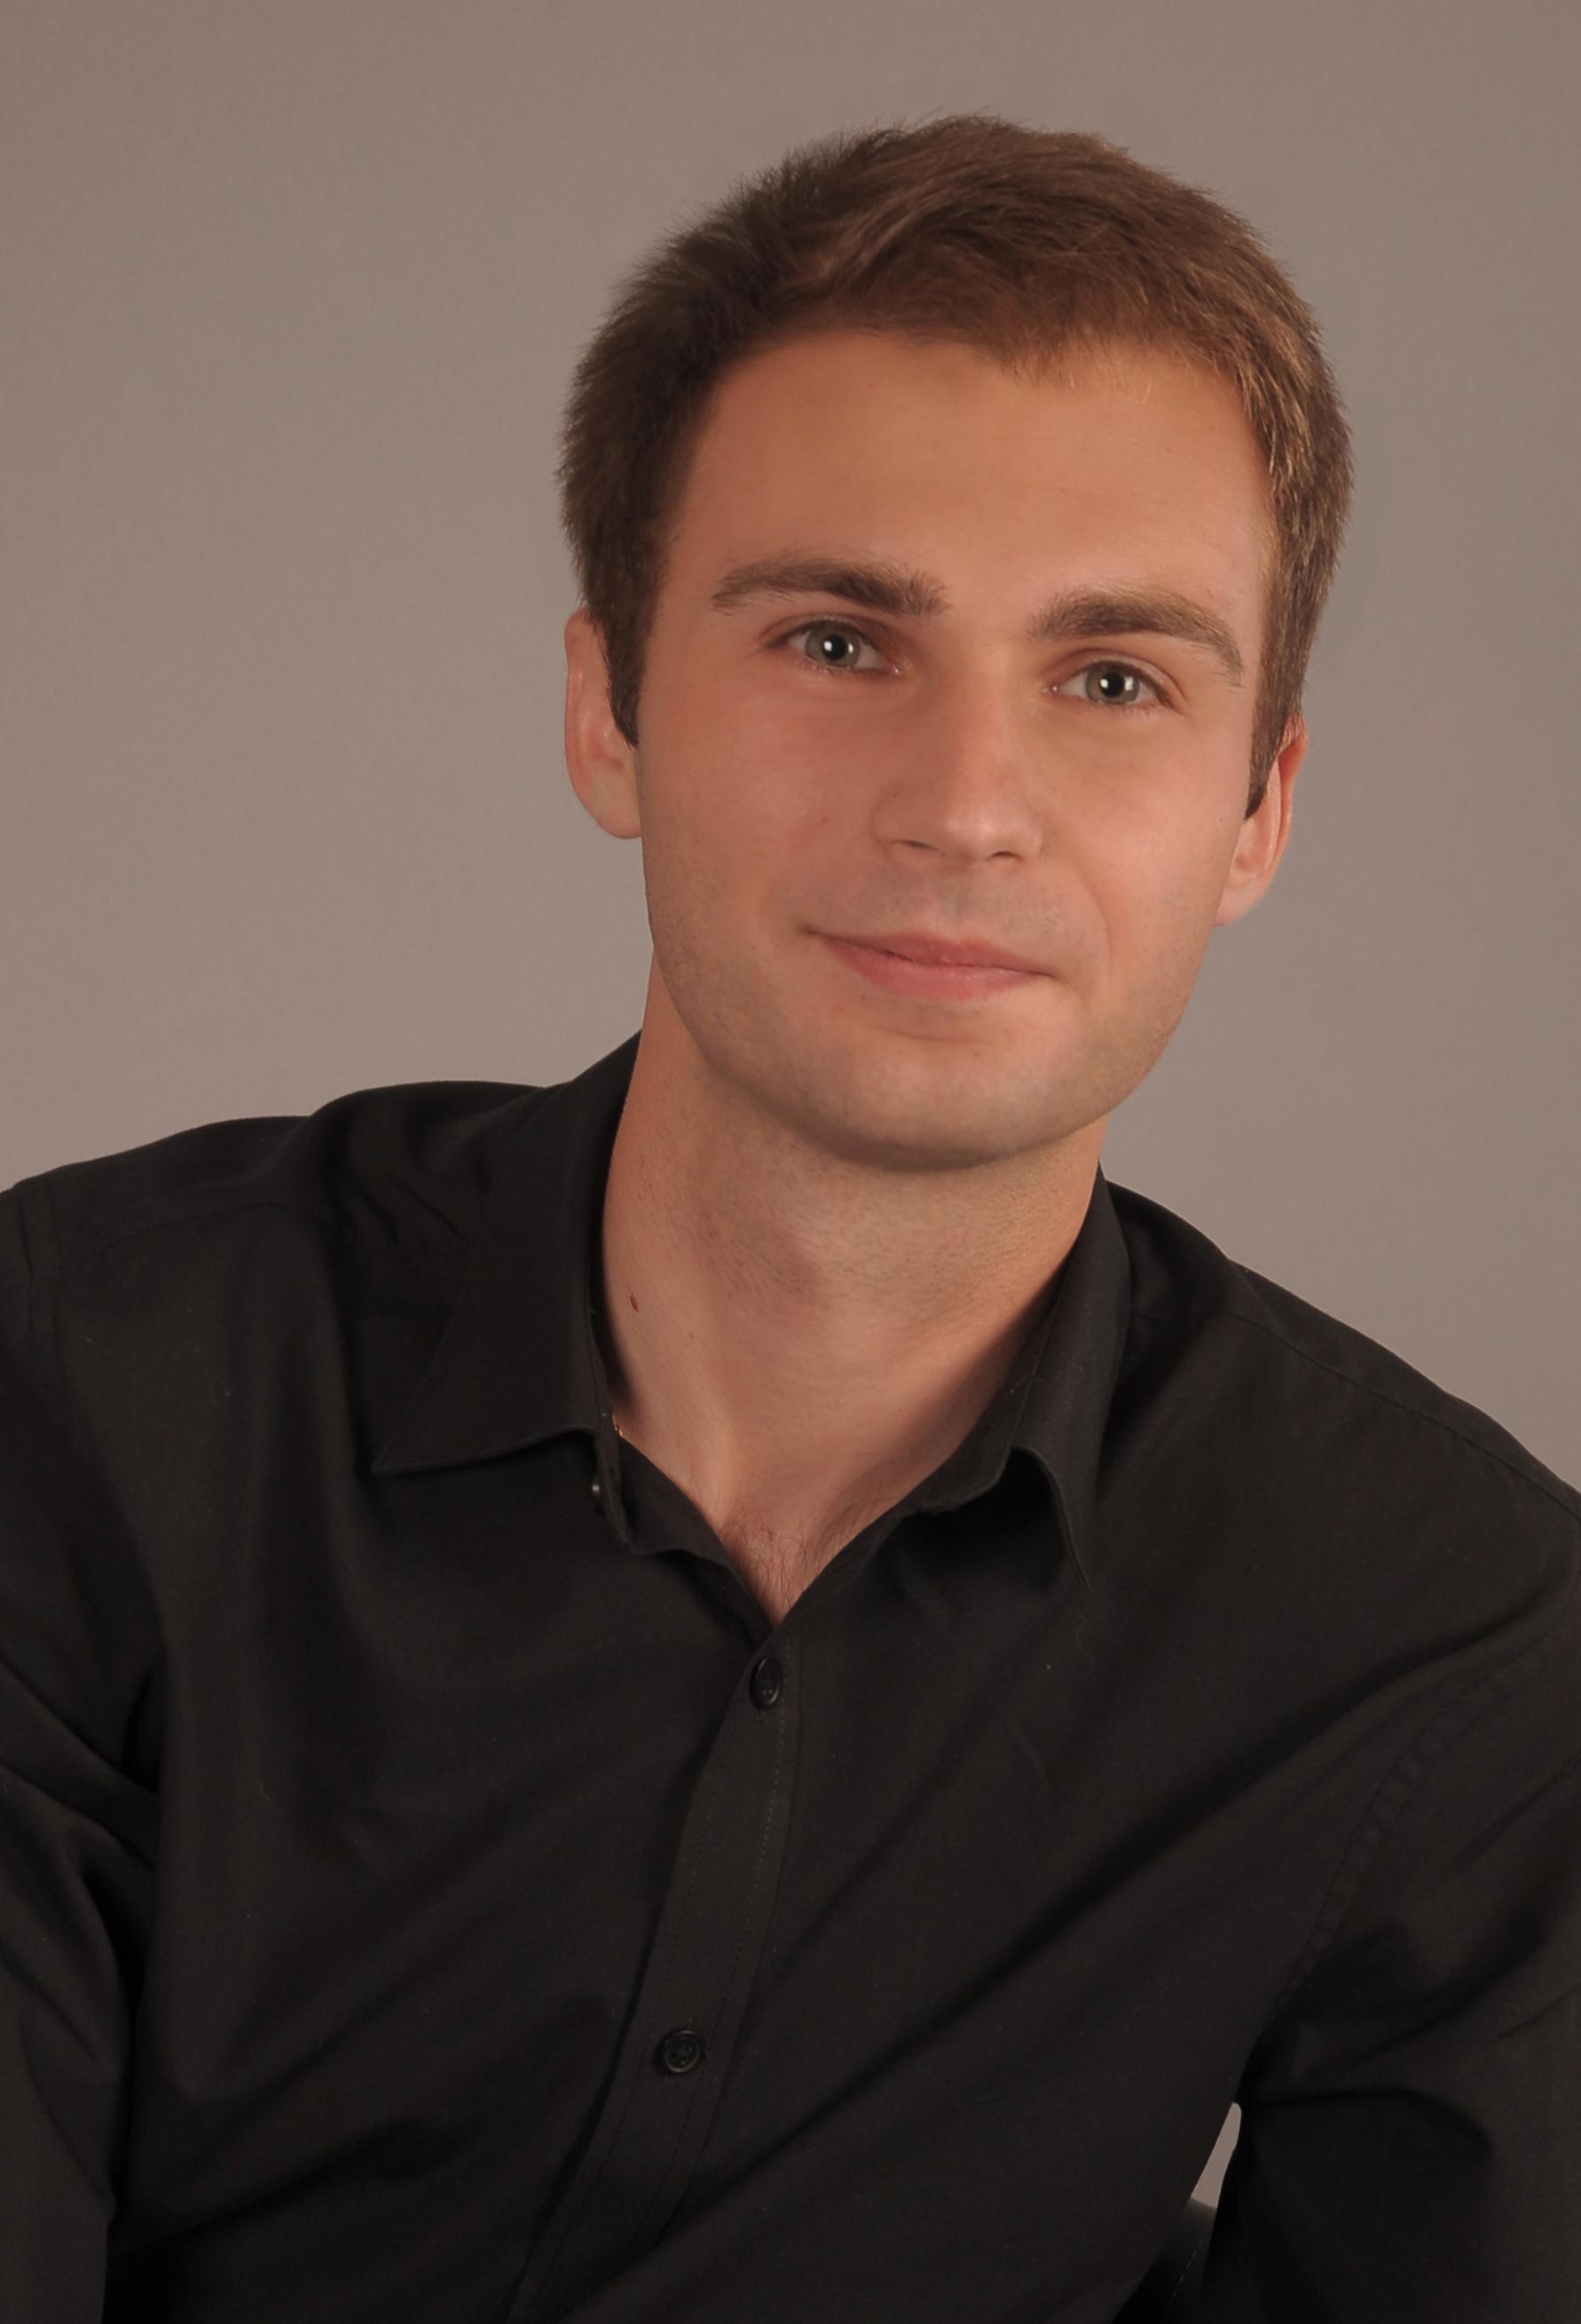 Тихомиров Кирилл Сергеевич